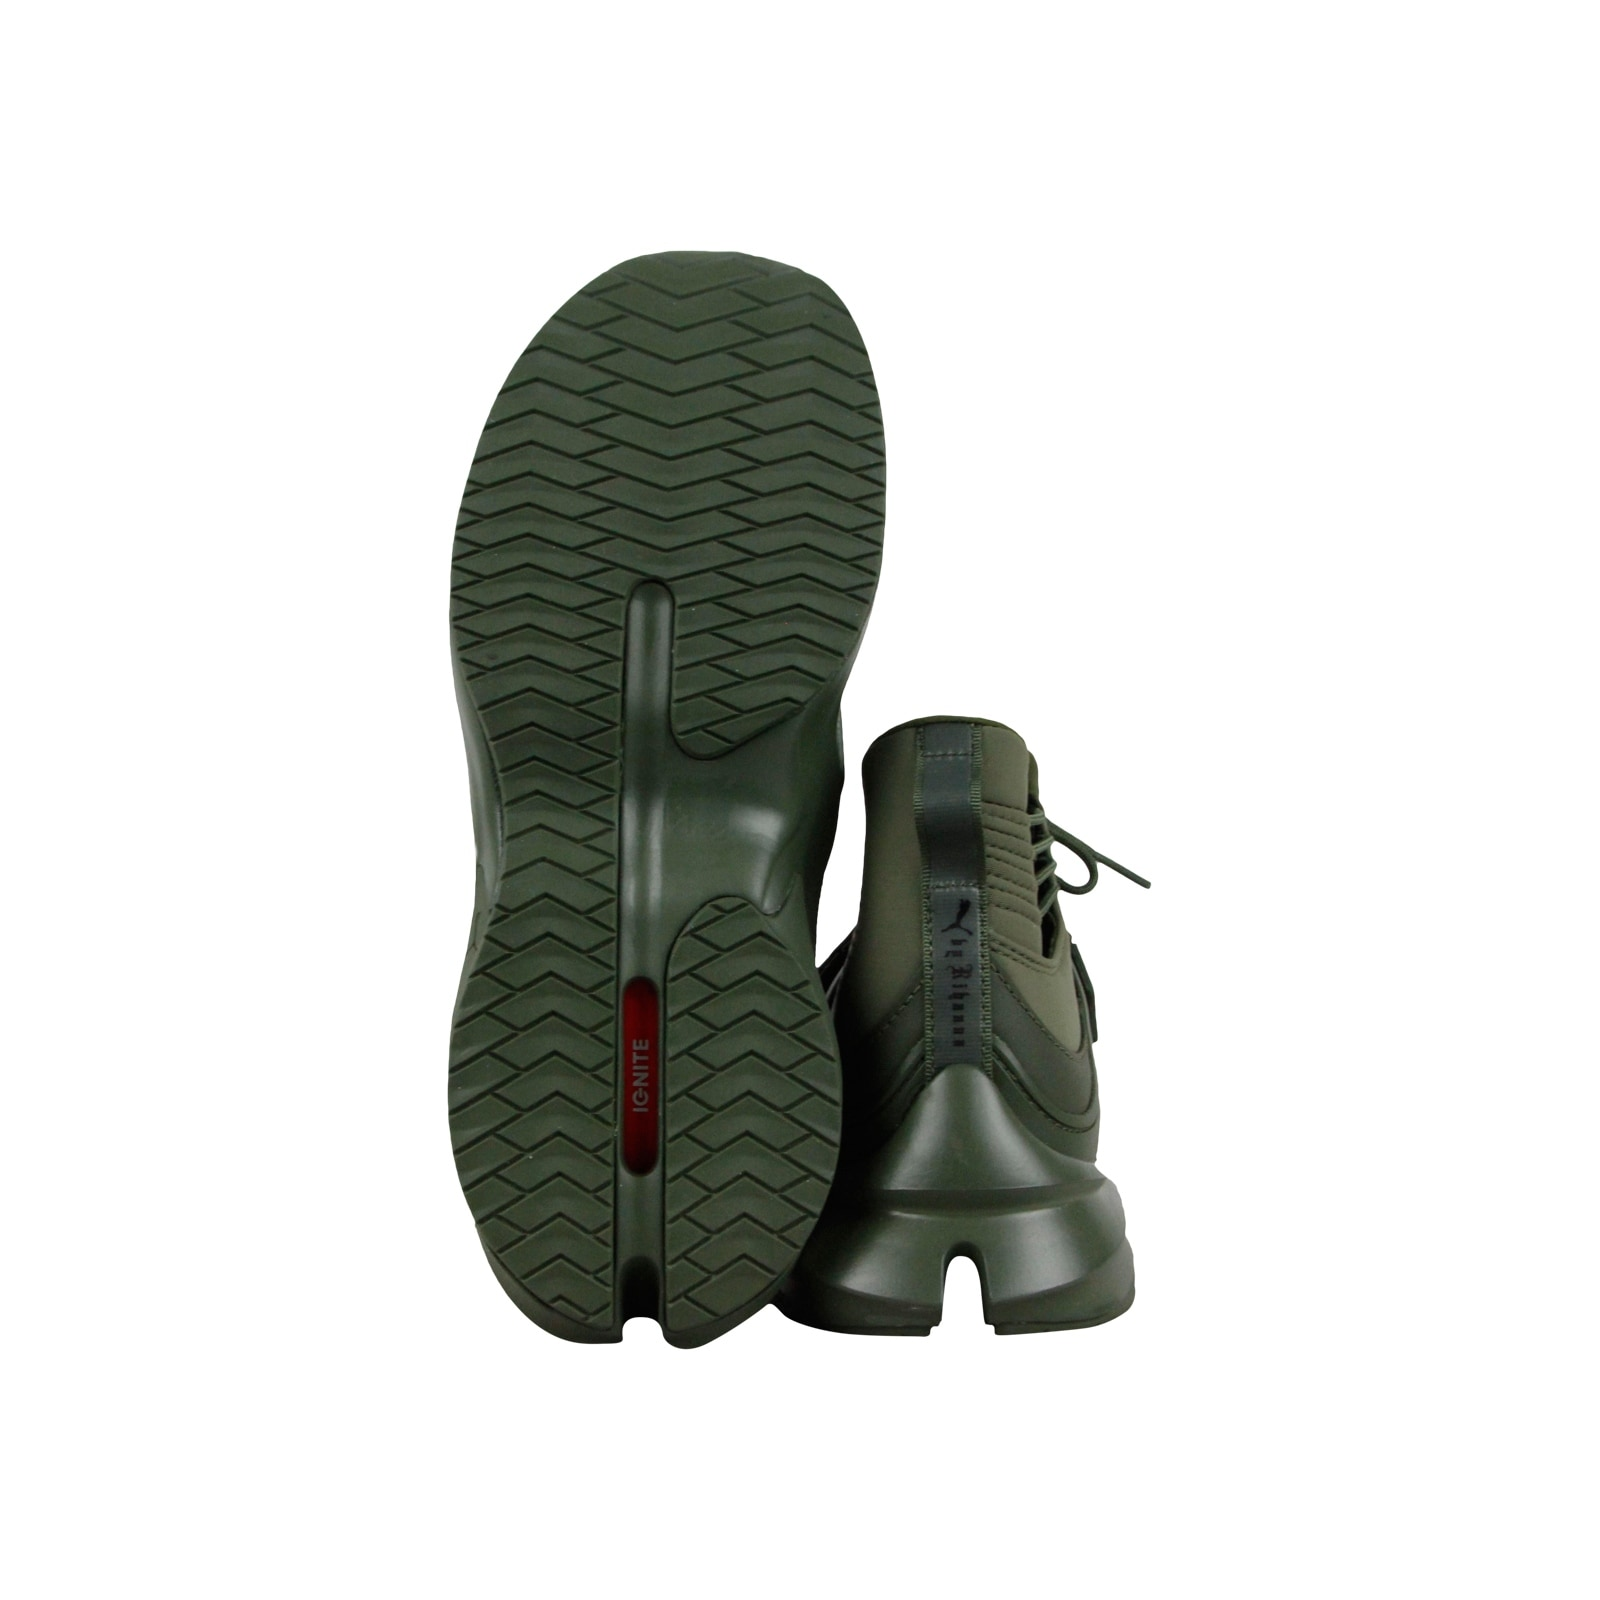 Shop Puma Womens Fenty by Rihanna Riri Green Trainer Hi 19039802 Athletic  Shoes - Free Shipping Today - Overstock - 25782148 1b2cf9a7a